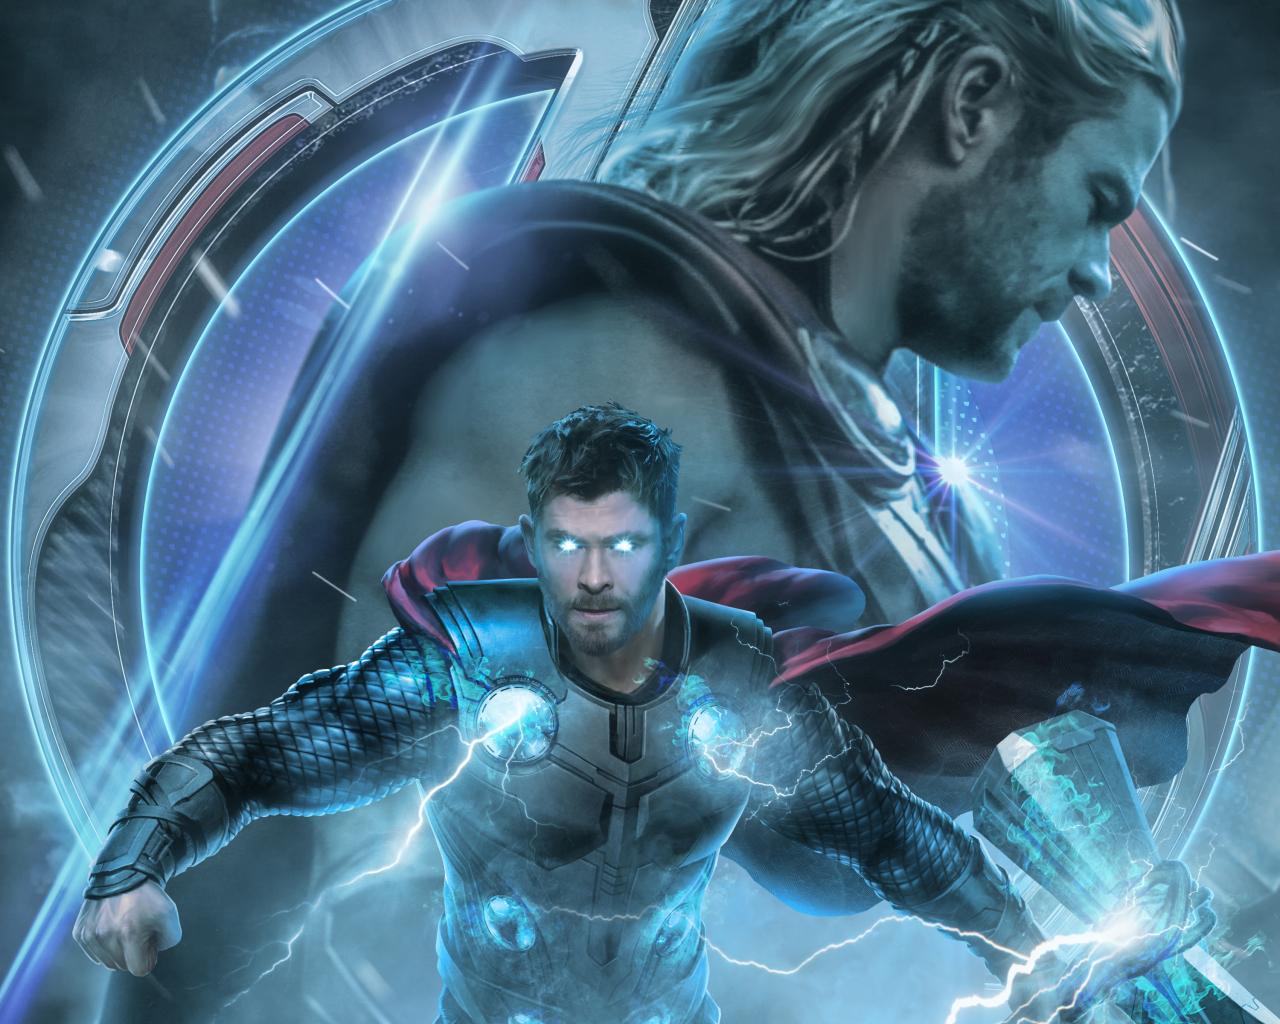 1280x1024 Avengers Endgame Thor Poster Artwork 1280x1024 1280x1024